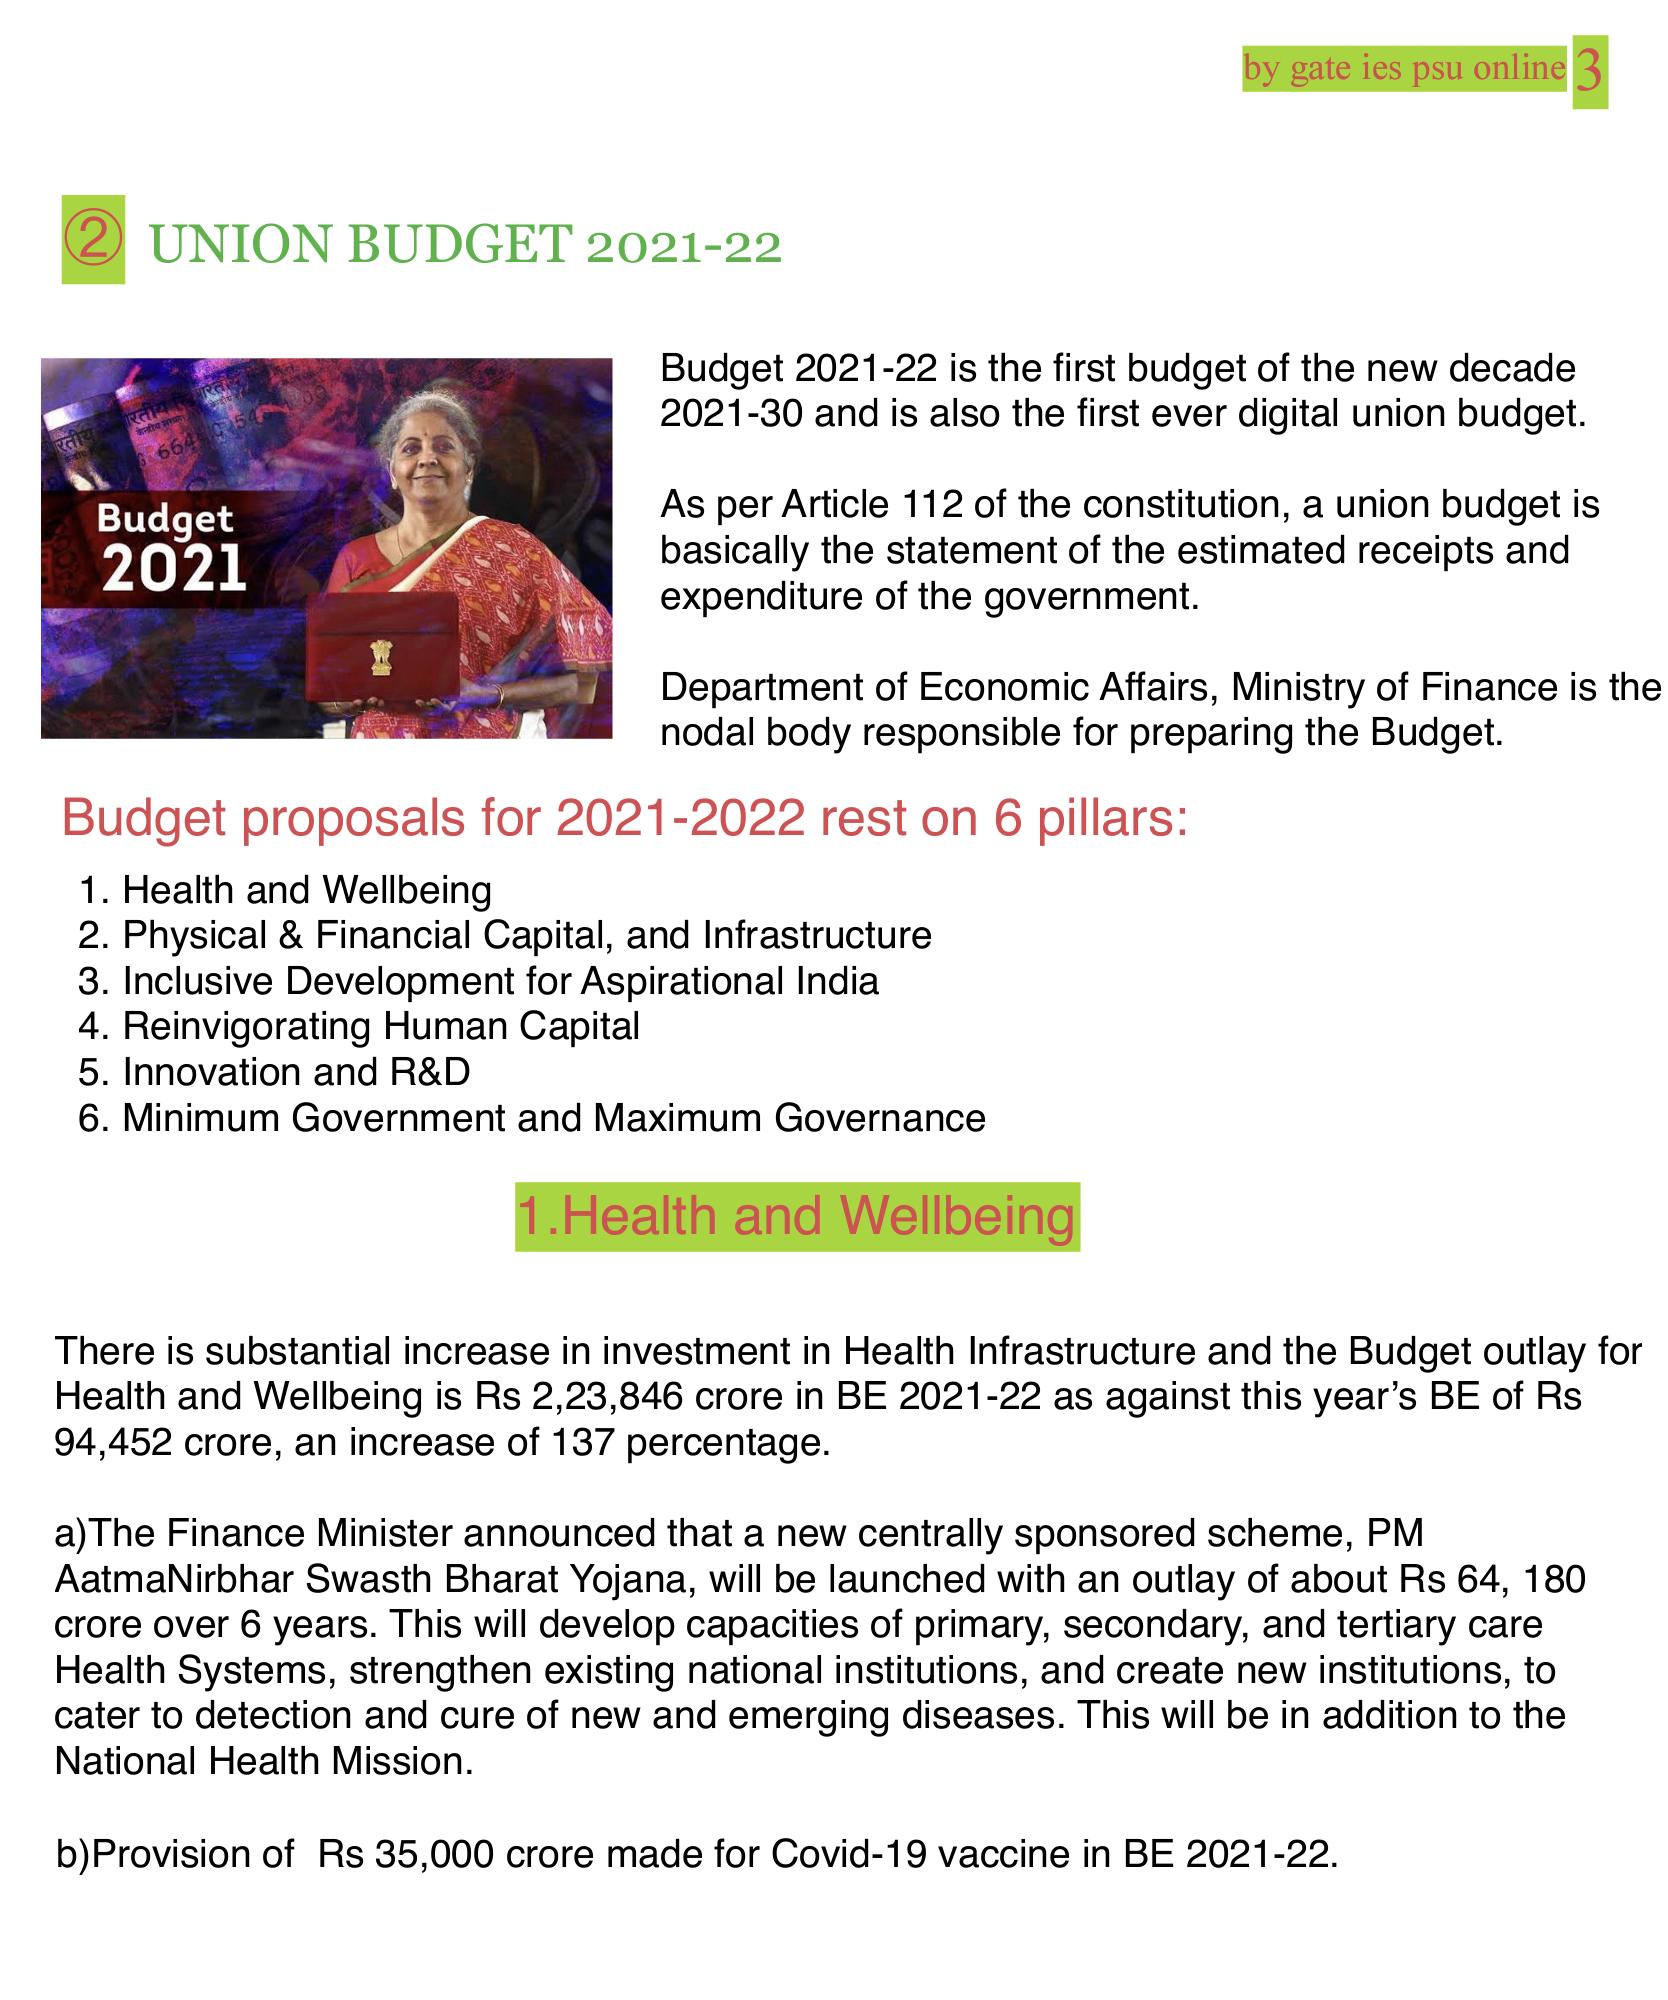 summary of union budget 2020-21 UPSC current affairs